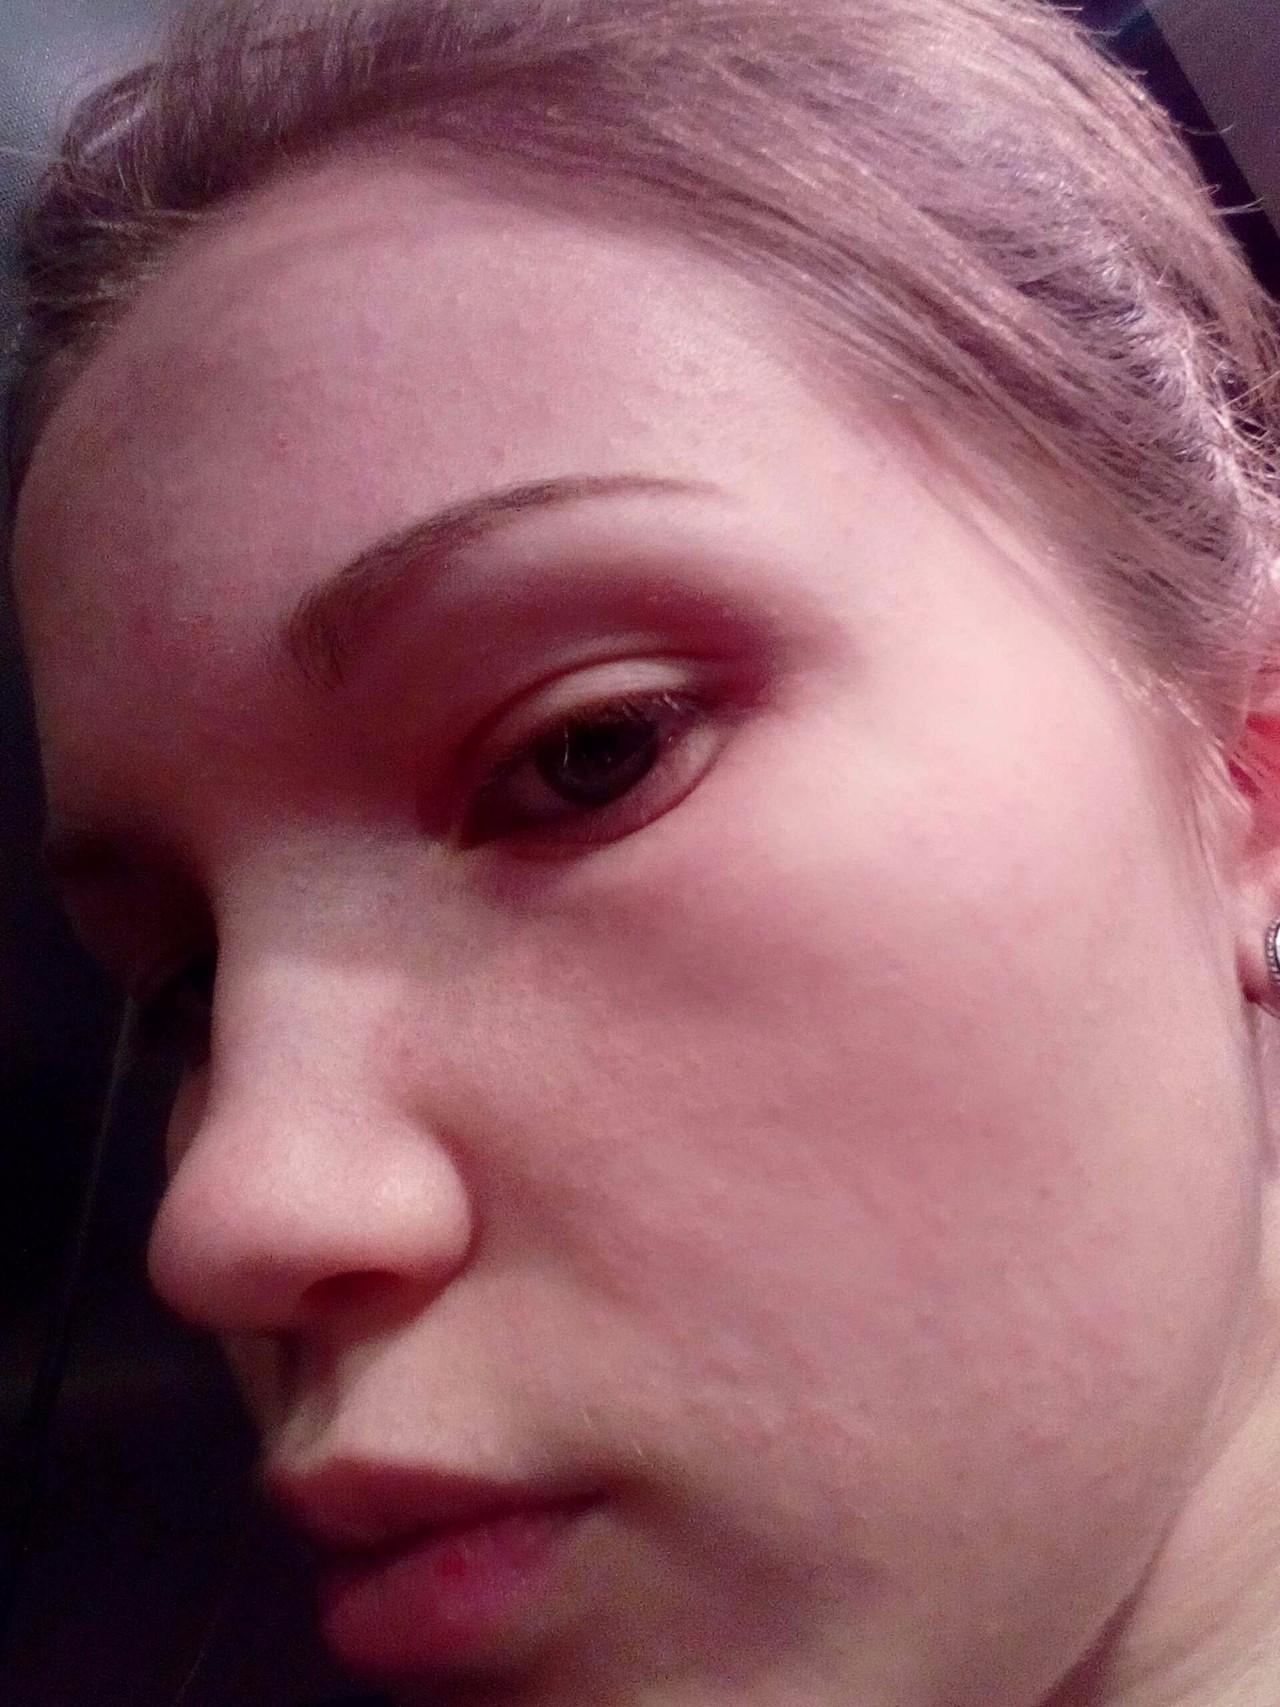 аллергия на пудру симптомы